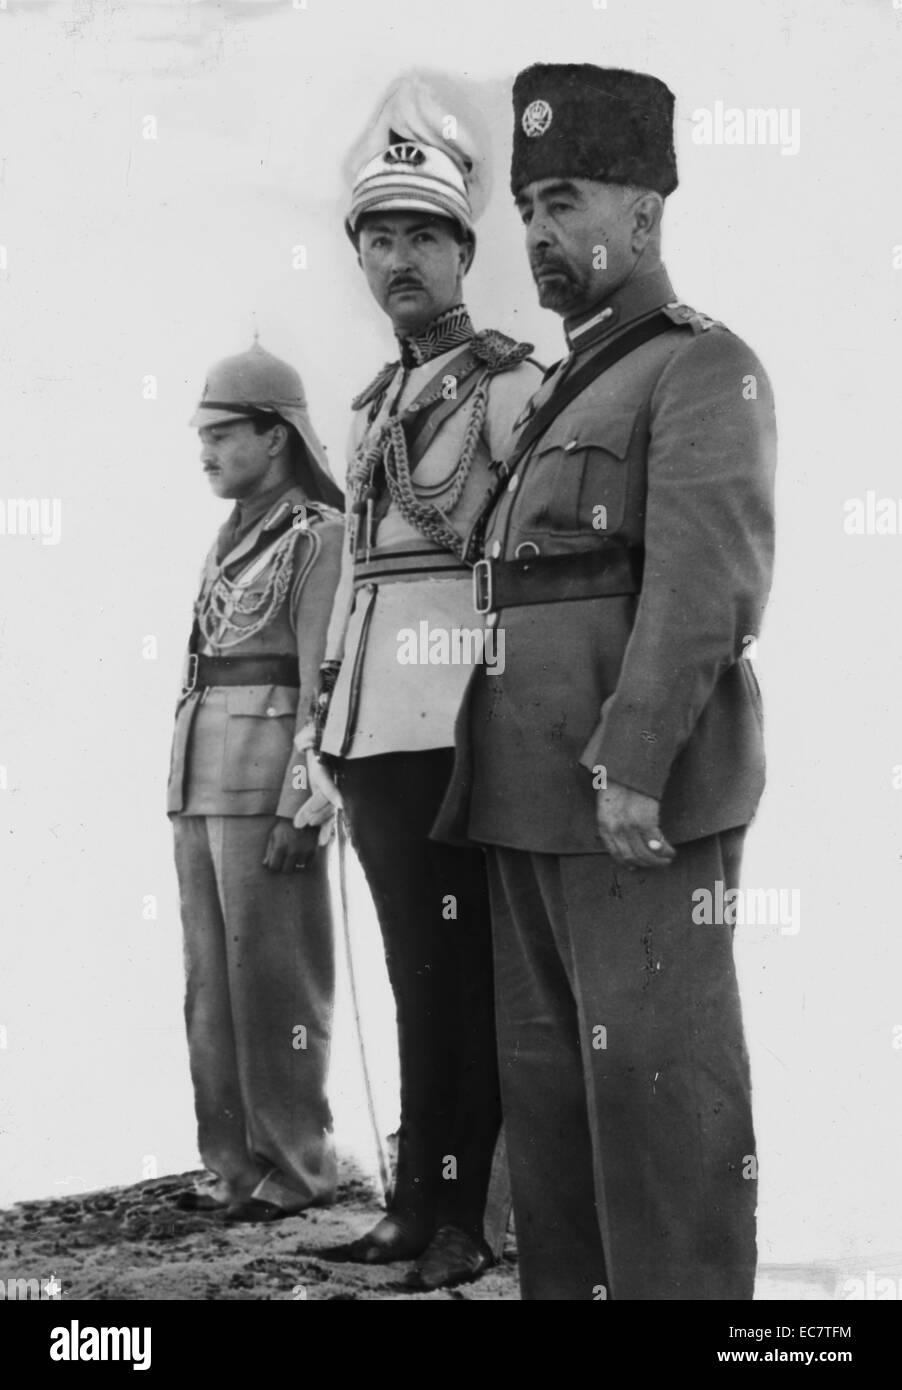 The Coronation of King Abdullah in Amman. From right to left, King Abdullah, Emir Abdul Illah (Regent of Iraq), Stock Photo